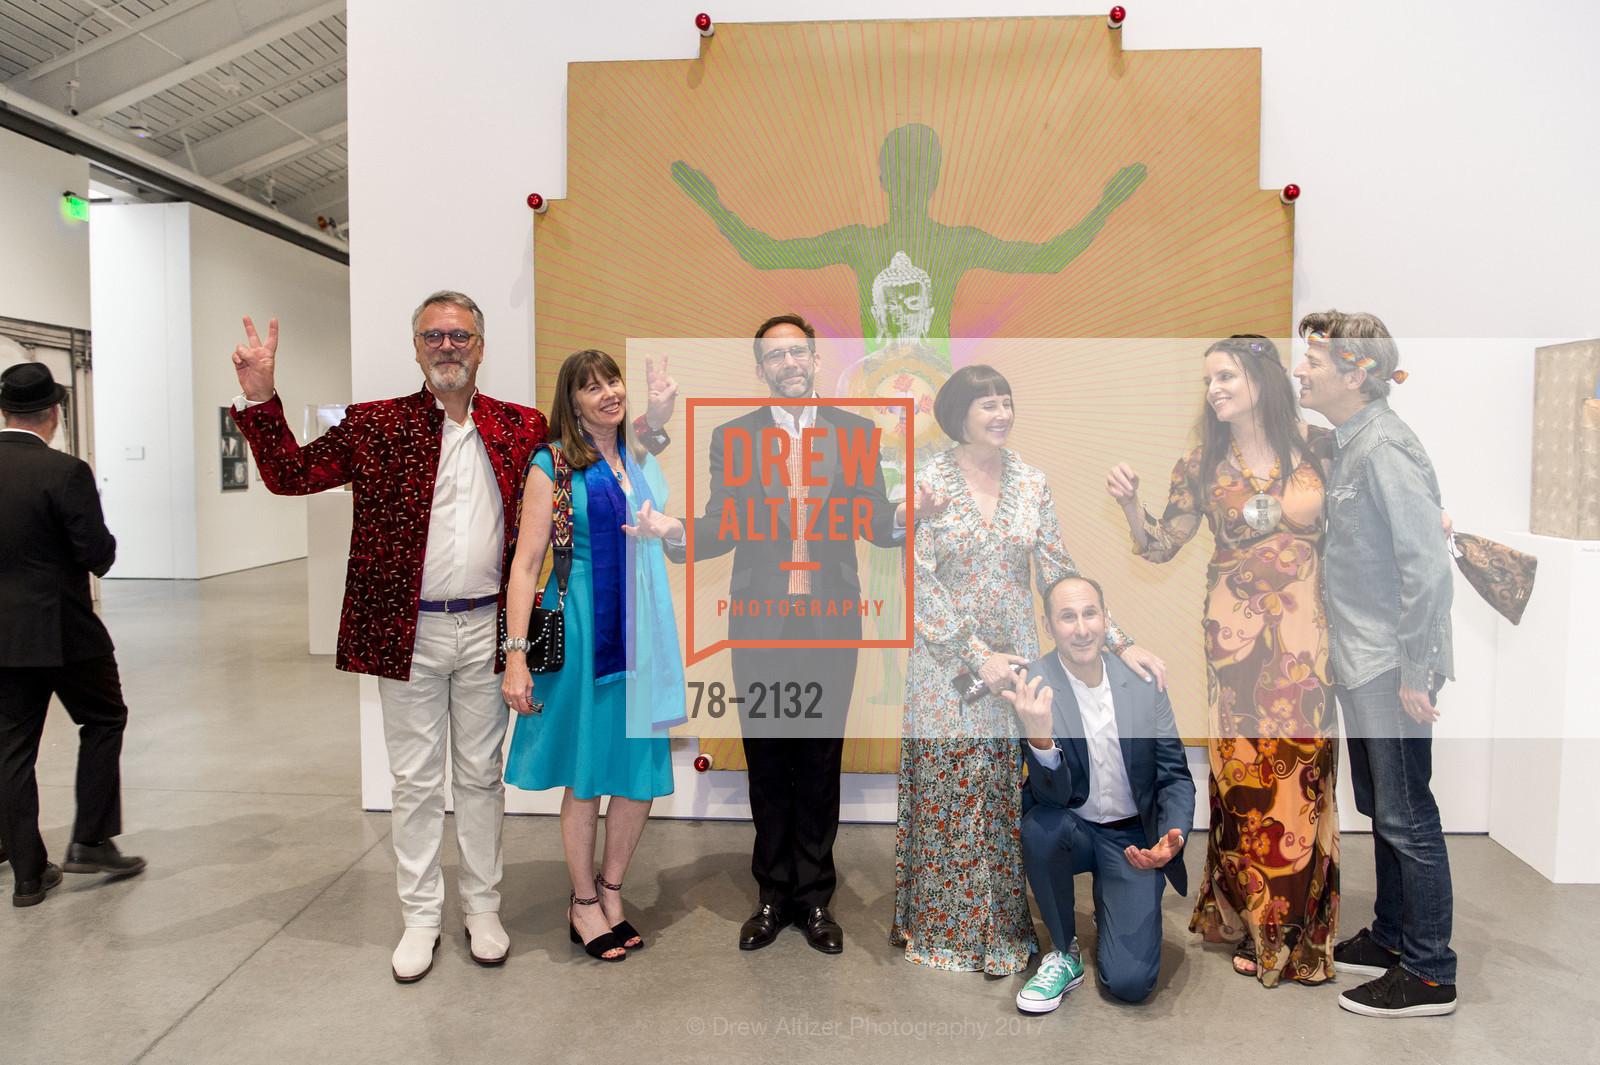 Nion McEvoy, Leslie Berriman, Larry Rinder, Carla Emil, Rich Silverstein, Carla Crane, David Crane, Photo #78-2132